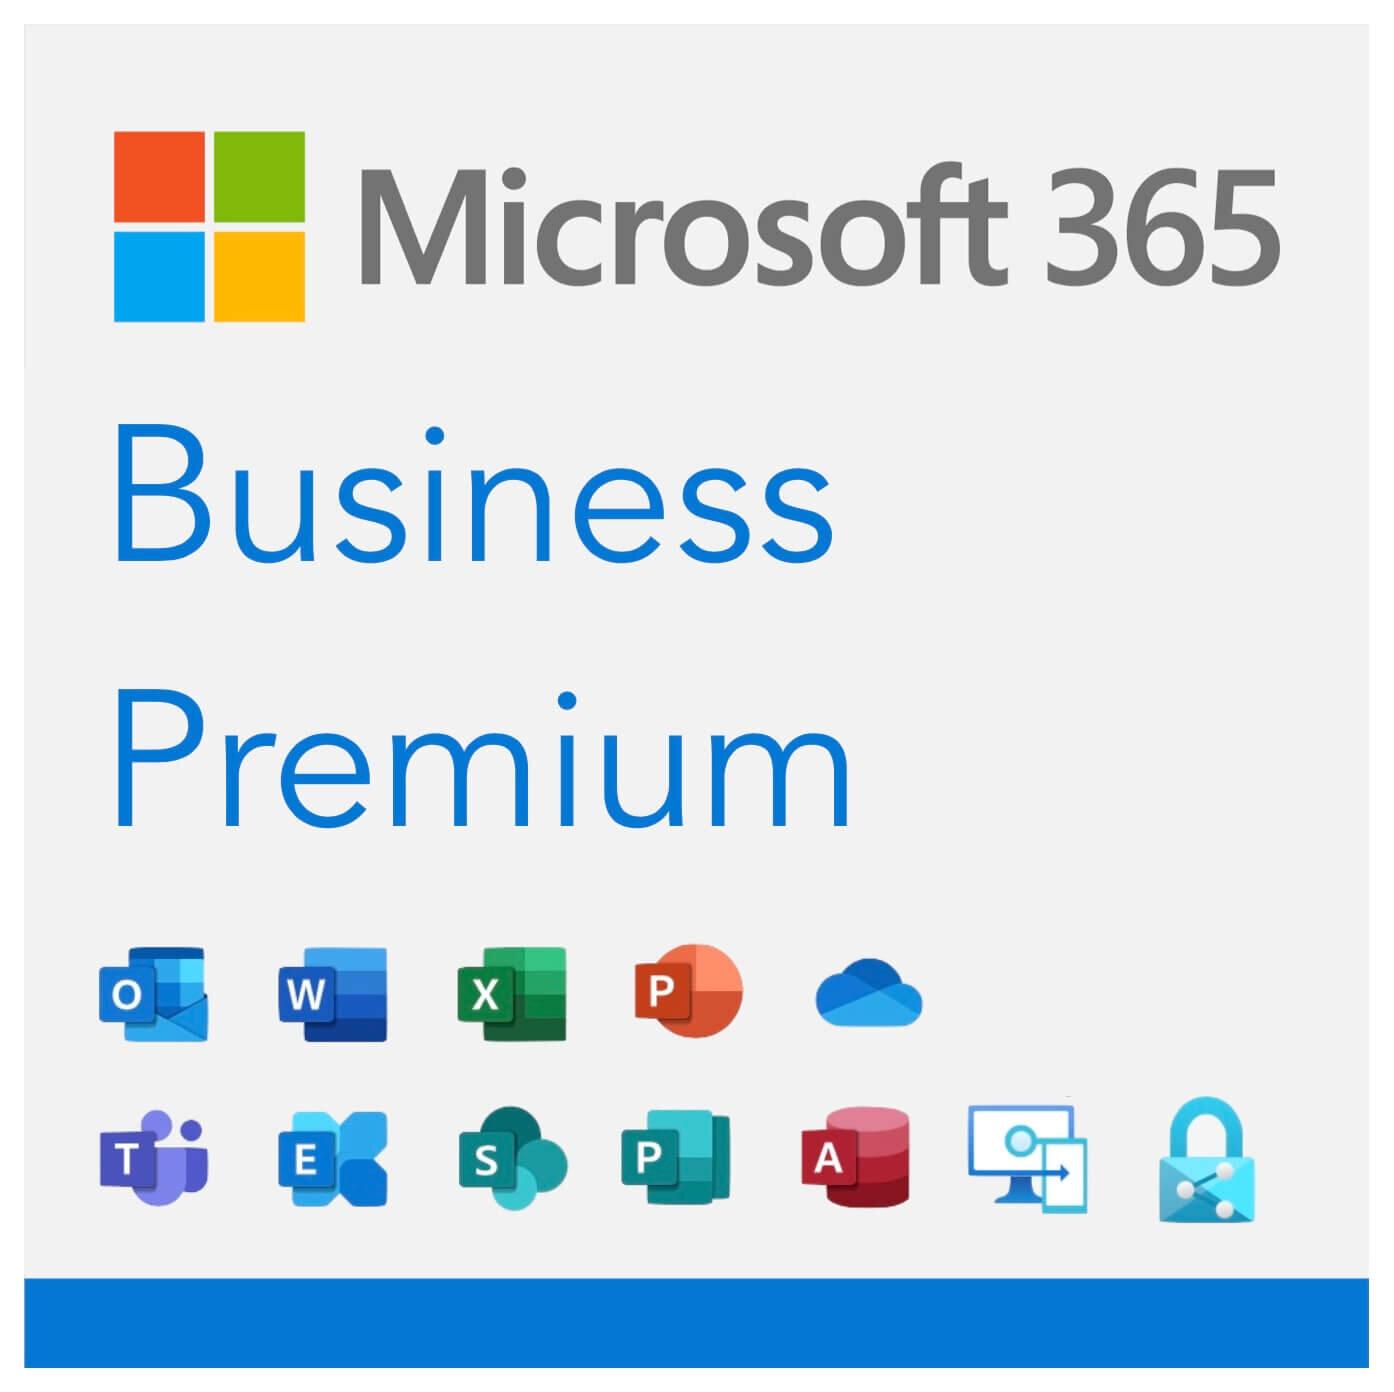 Microsoft 365 Business Premium Best Deal Today UK